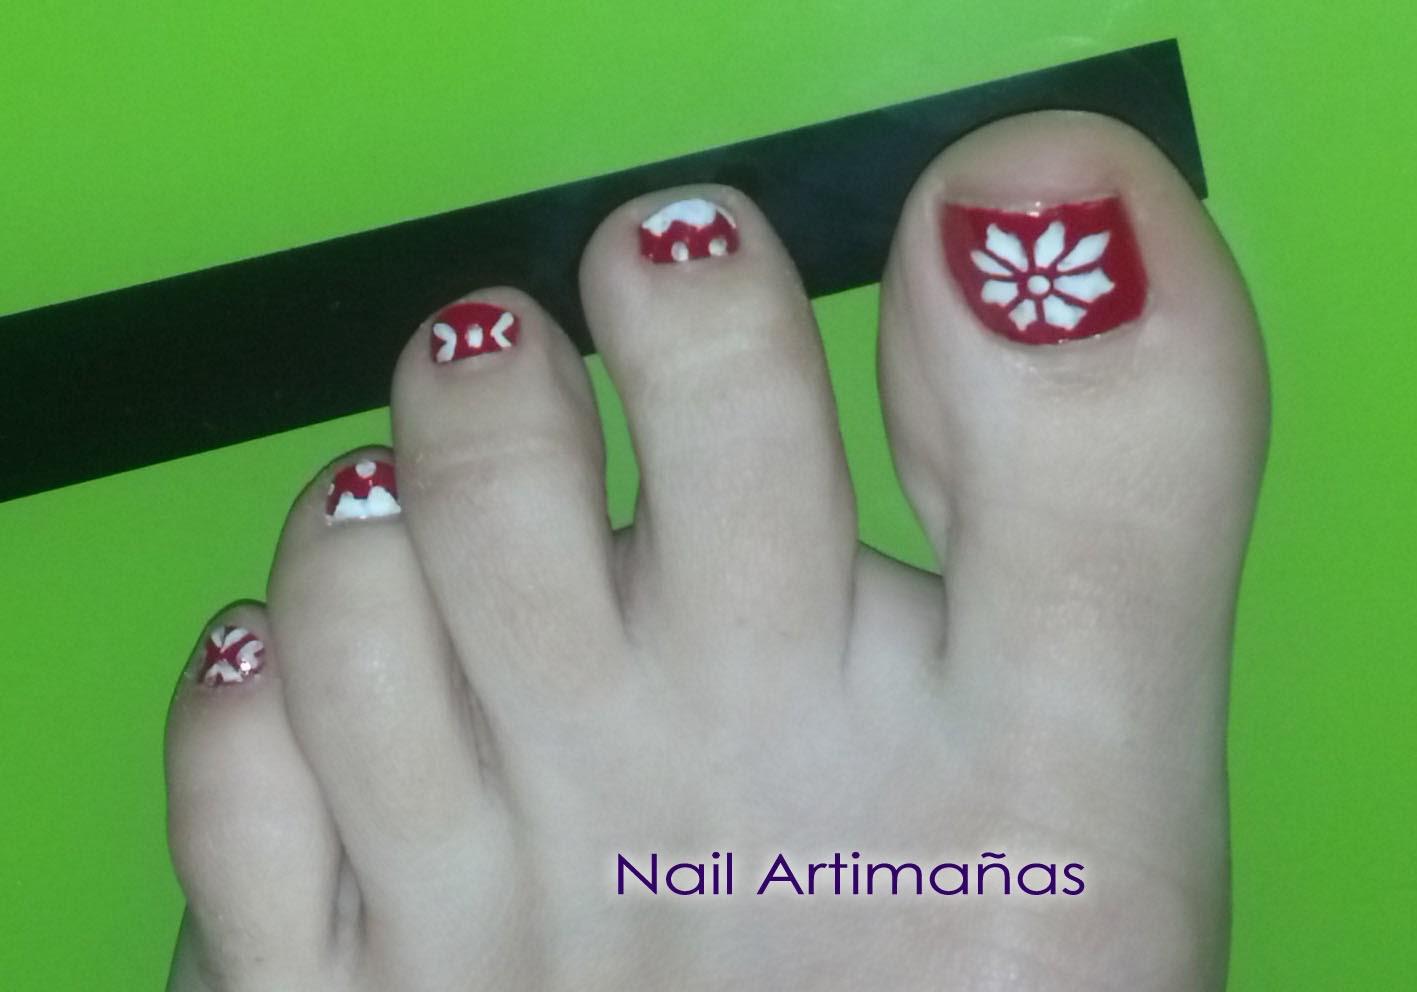 nail artimañas: enero 2014